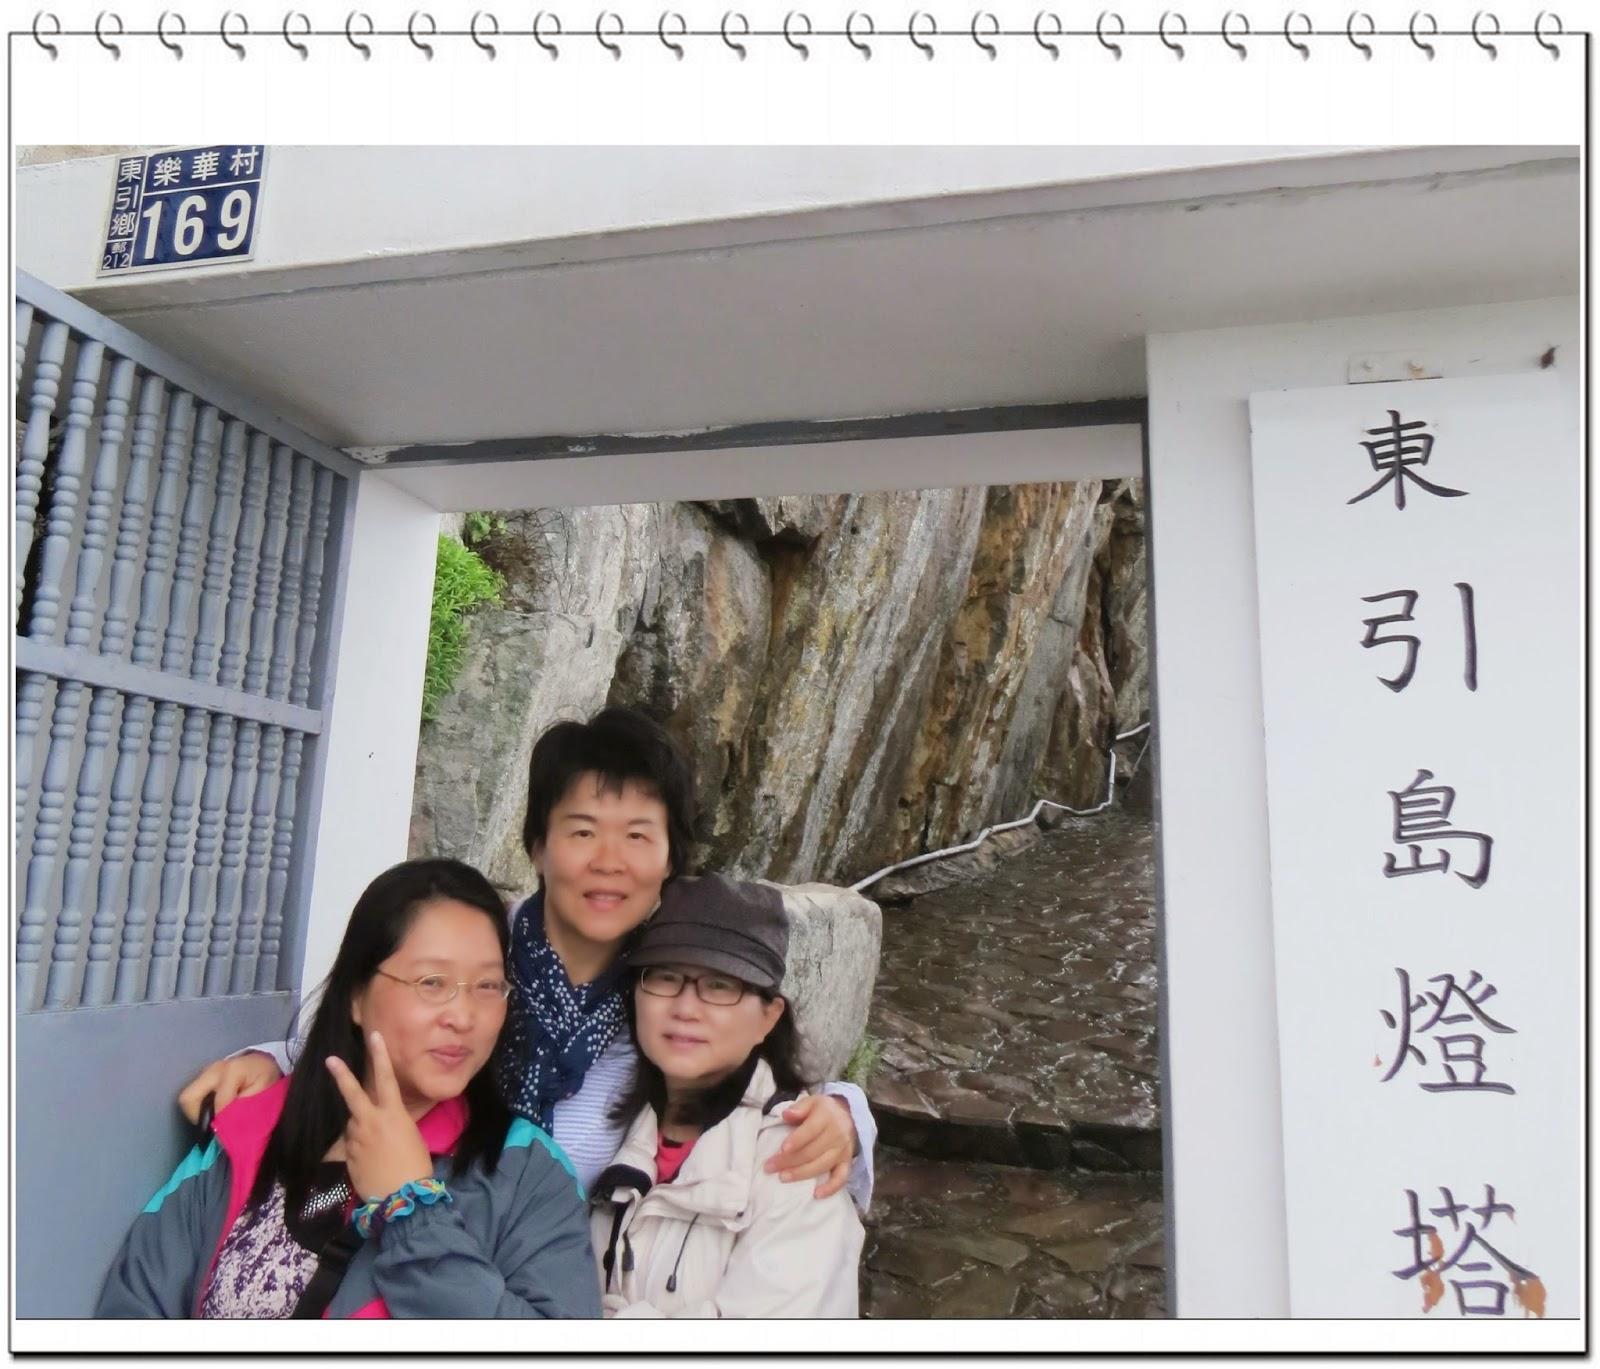 lifebaby-home: 2014-05-23 馬祖行 (第三天東引上半天)